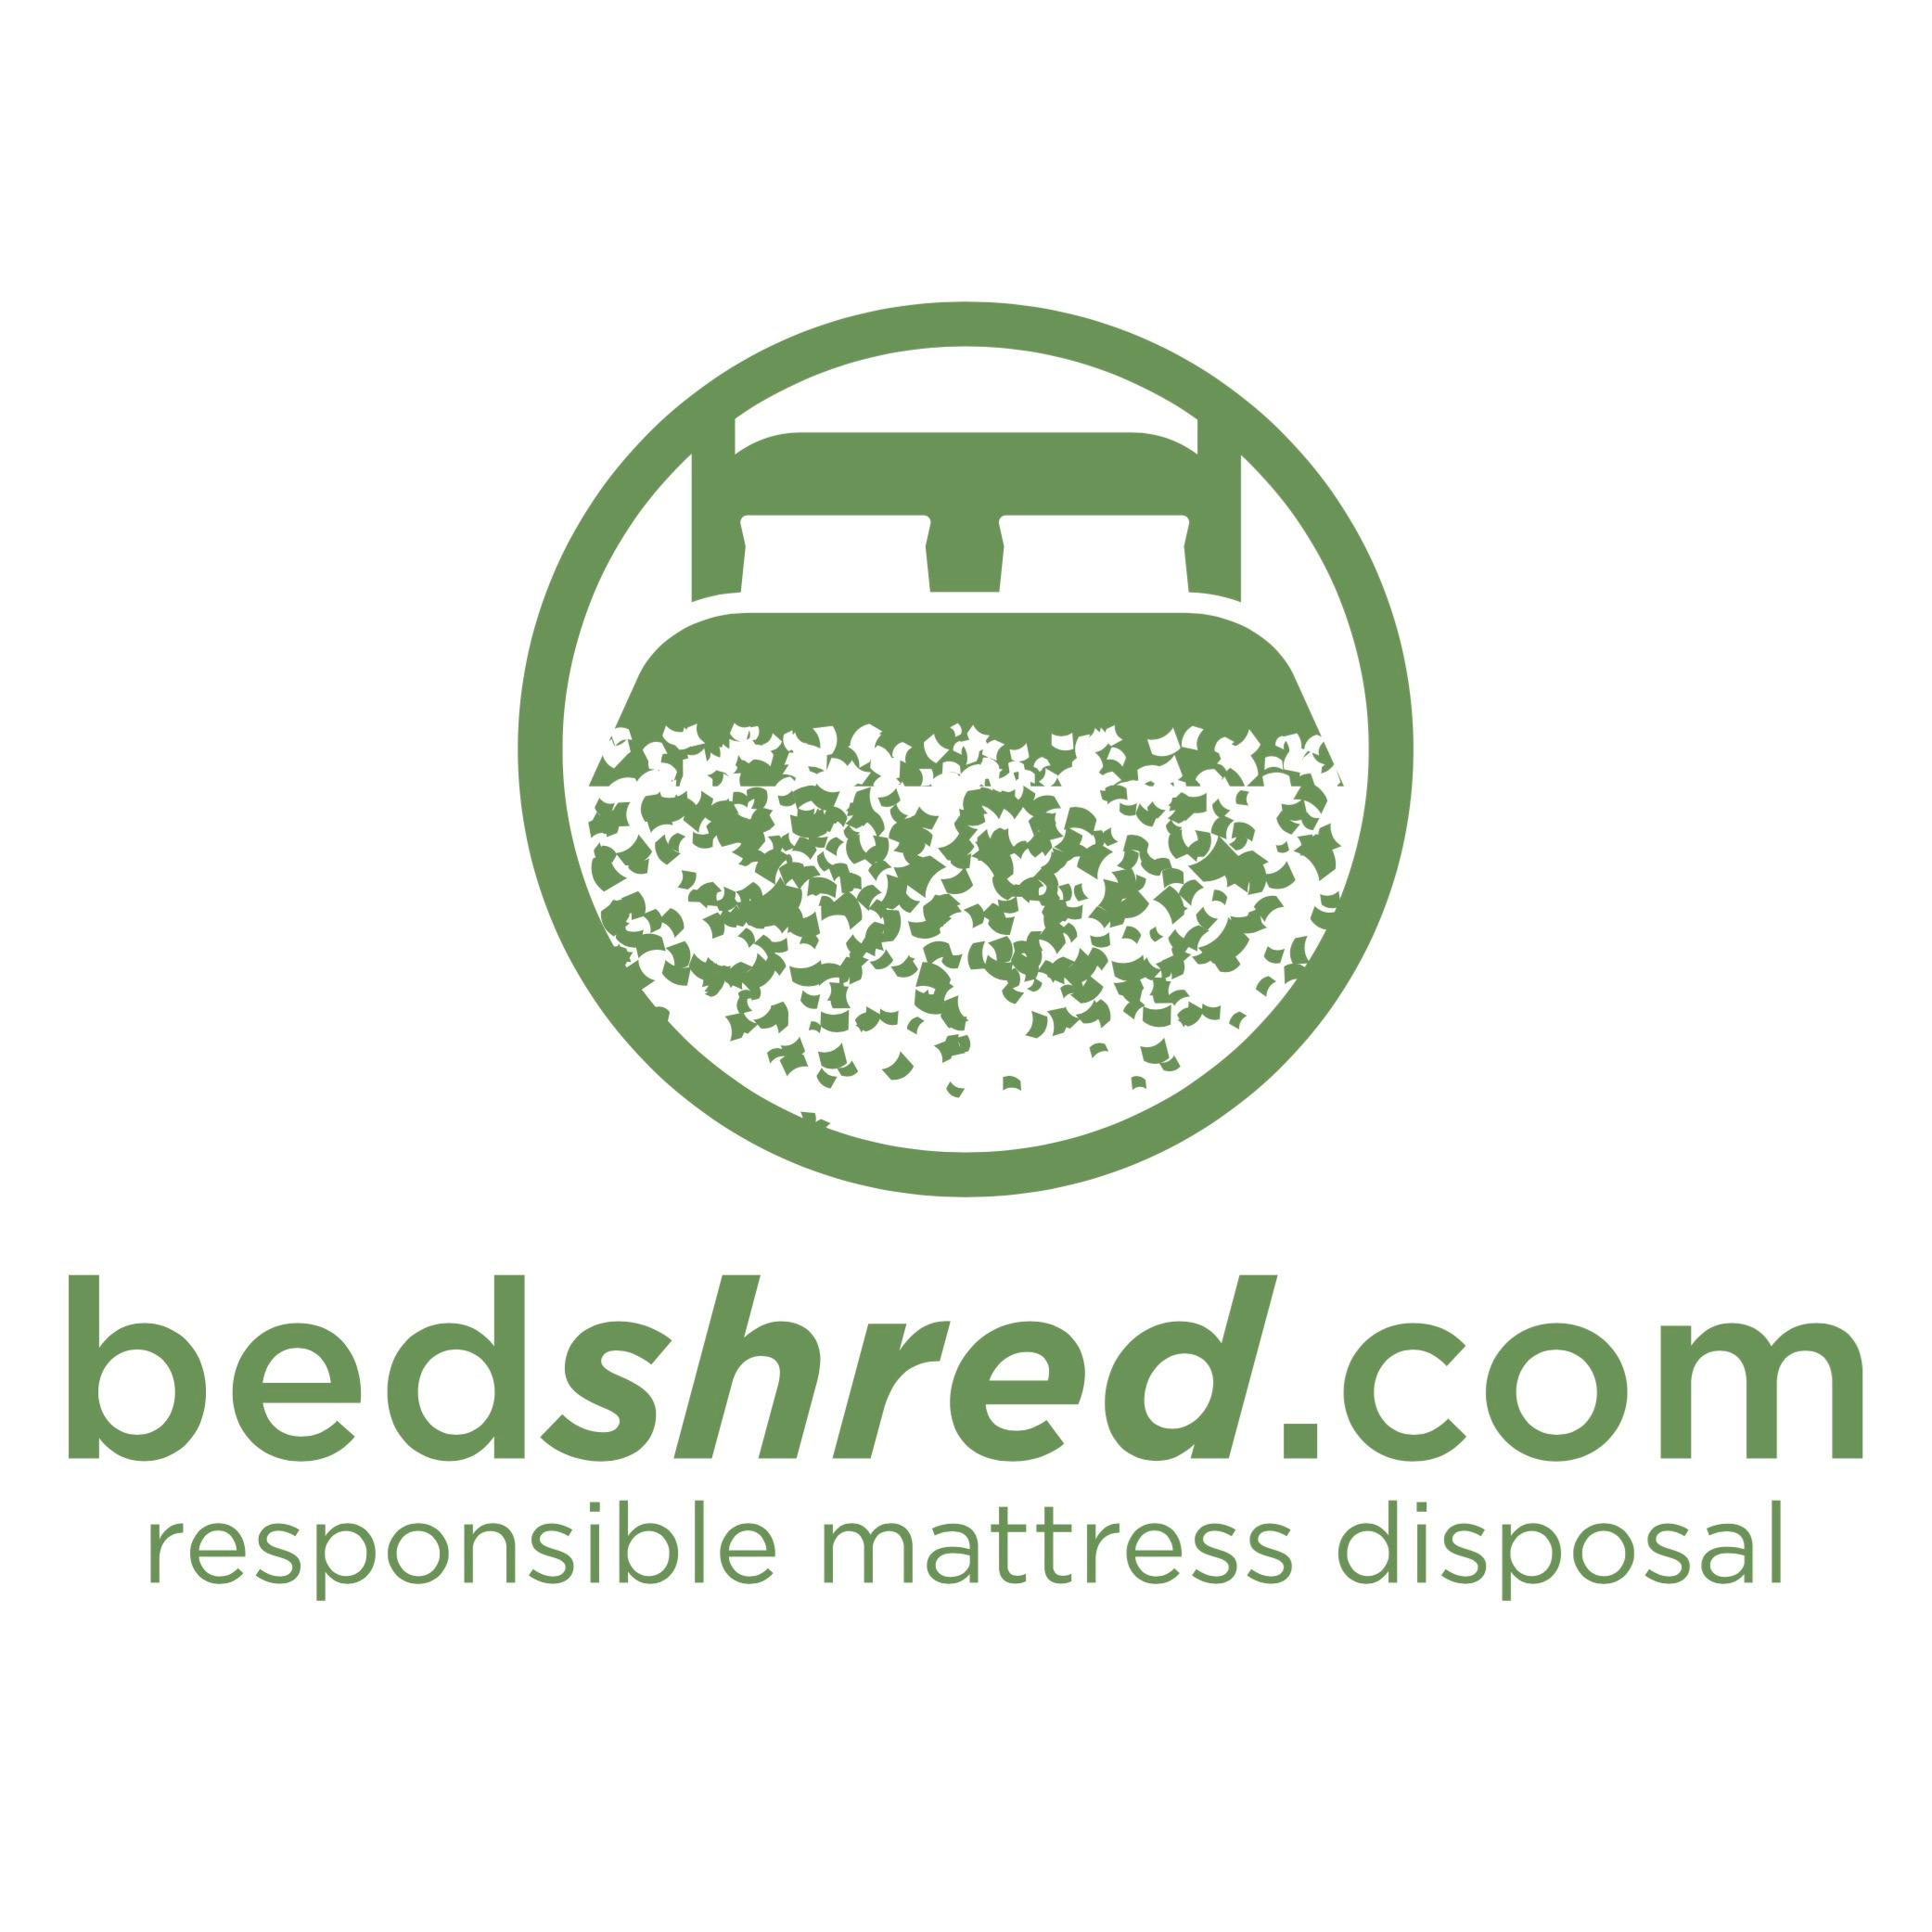 BedShred.com